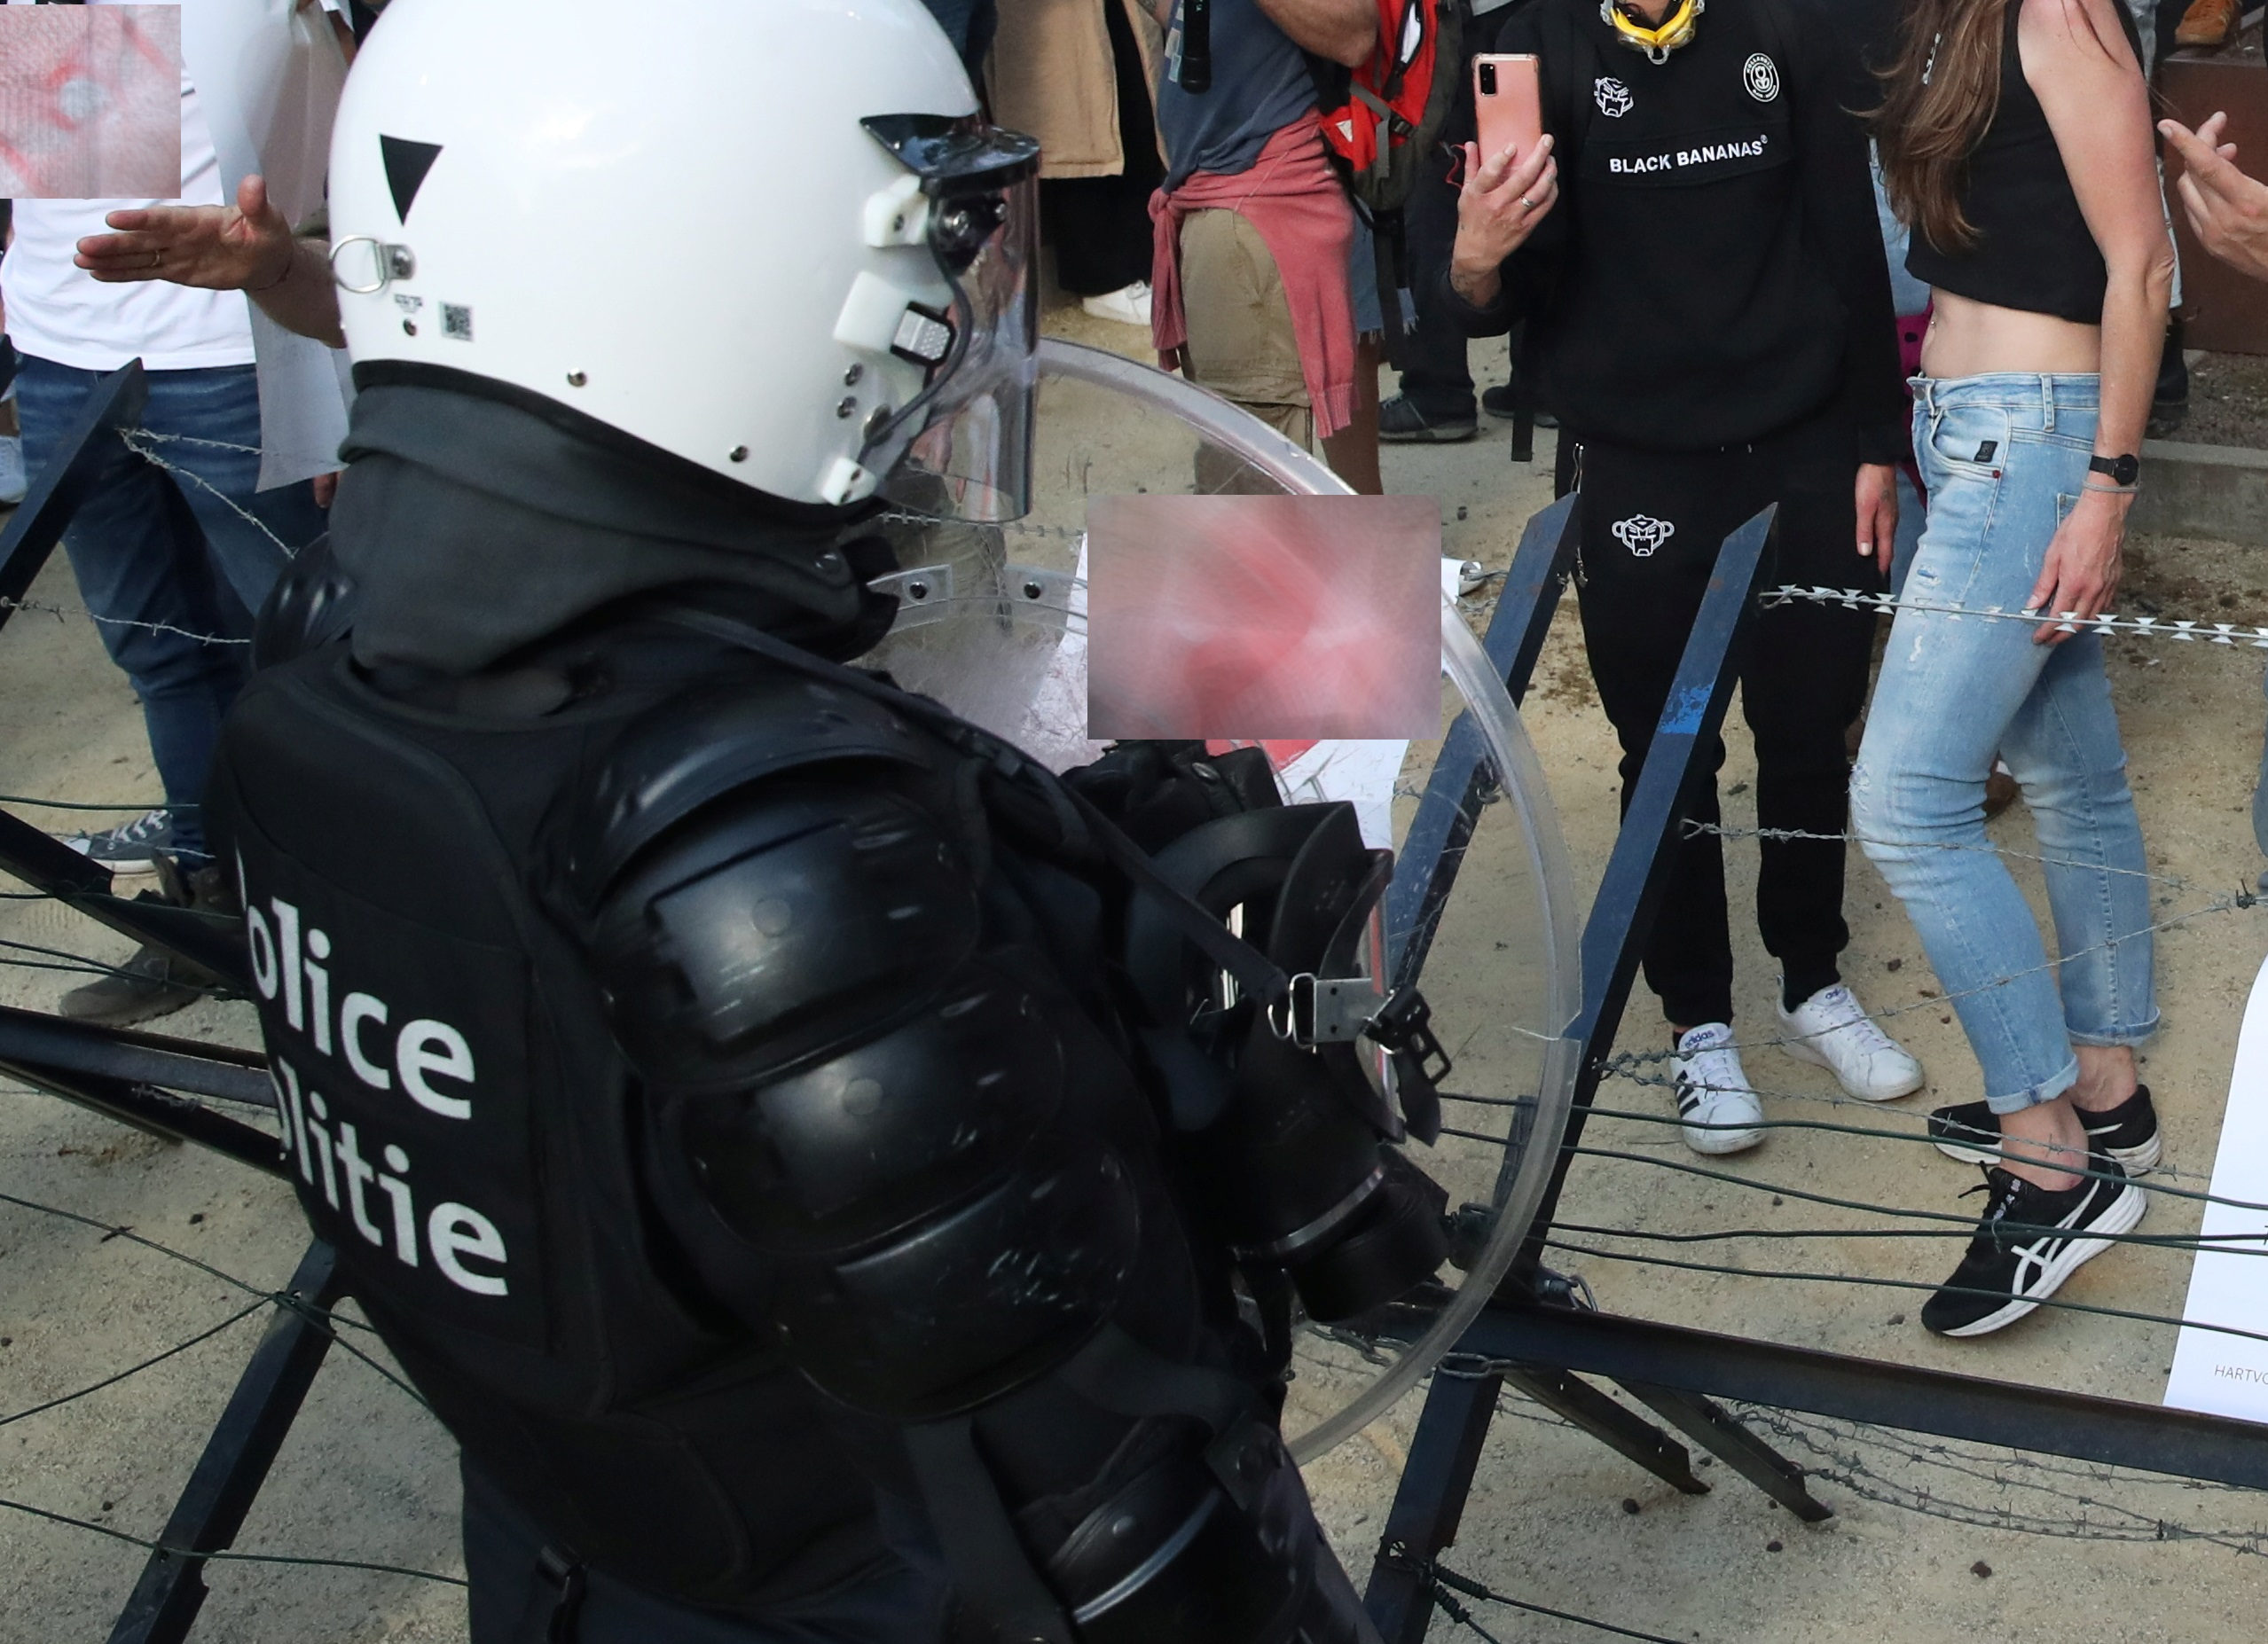 Europol: Εξτρεμιστές και τζιχαντιστές προσπάθησαν να εκμεταλλευτούν την πανδημία για προπαγανδιστικούς σκοπούς